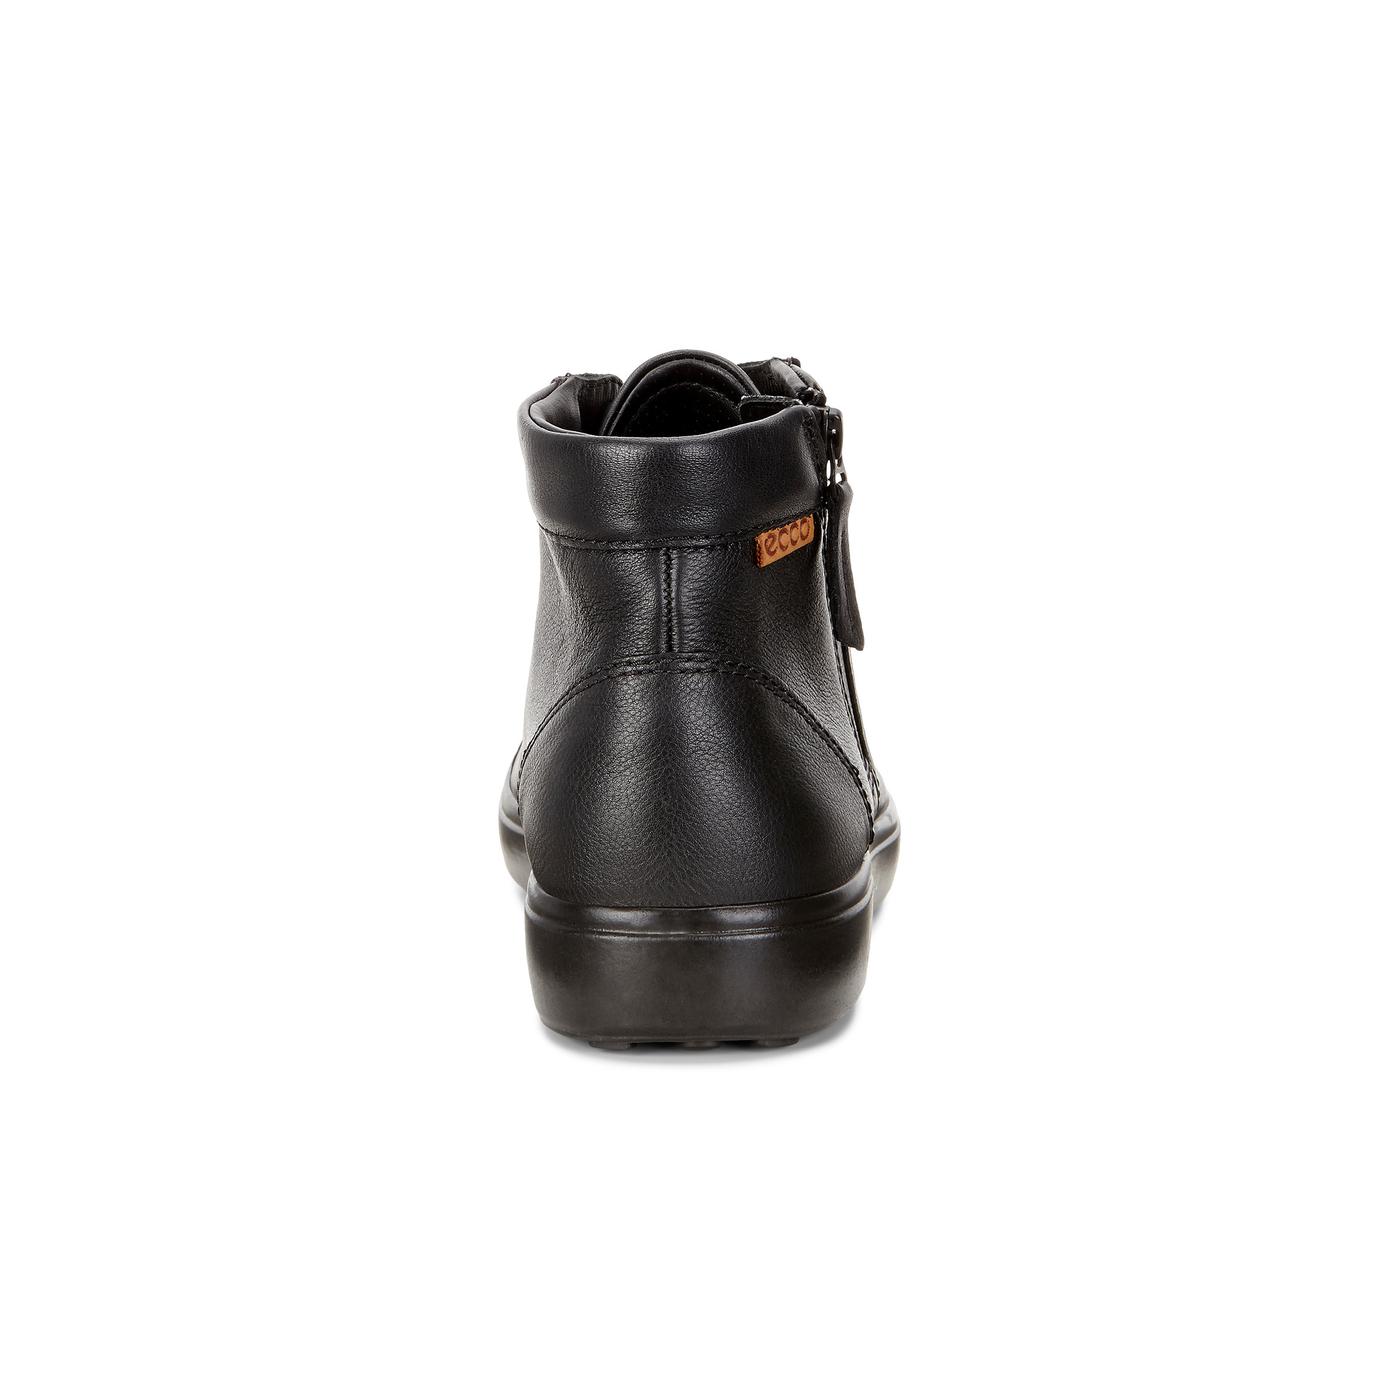 ECCO SOFT 7 MEN'S Sneaker Ankl